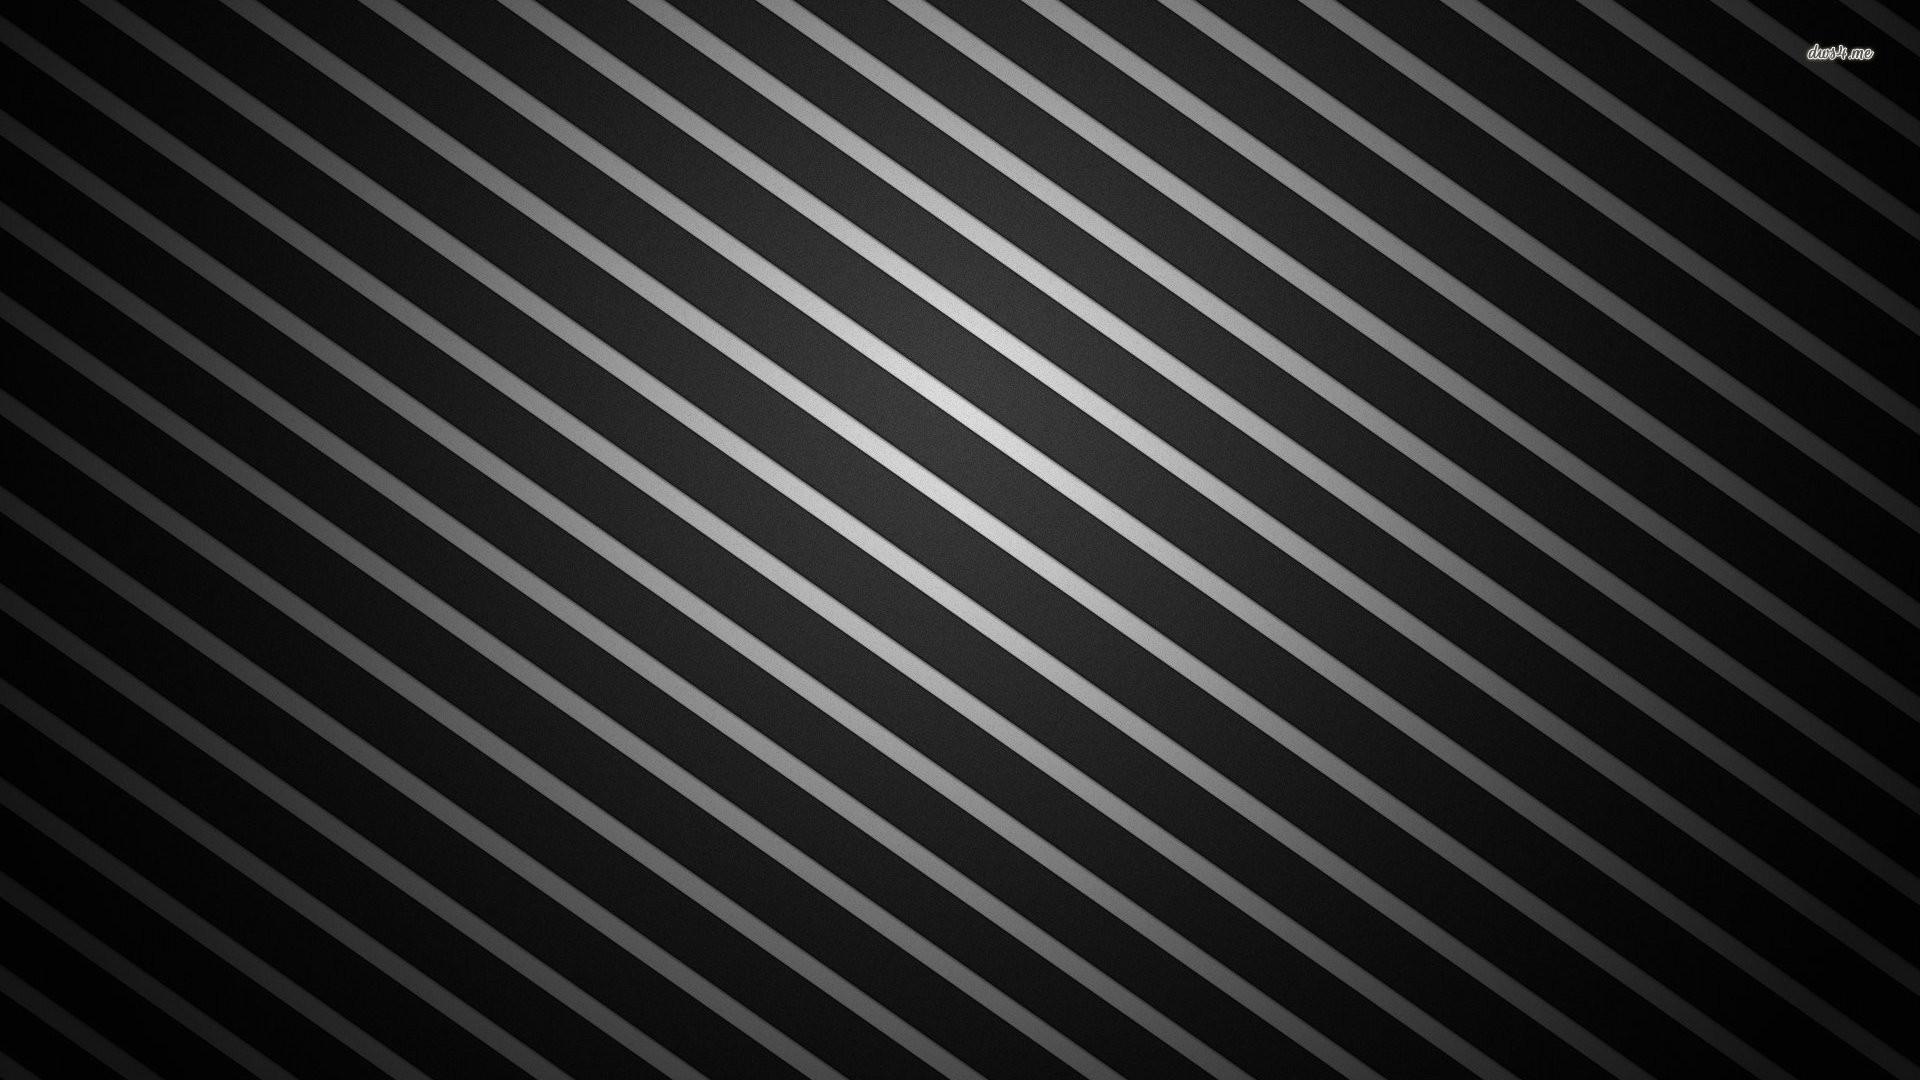 Black And Silver Wallpaper 2 Desktop Wallpaper. Black And Silver Wallpaper  2 Desktop Wallpaper